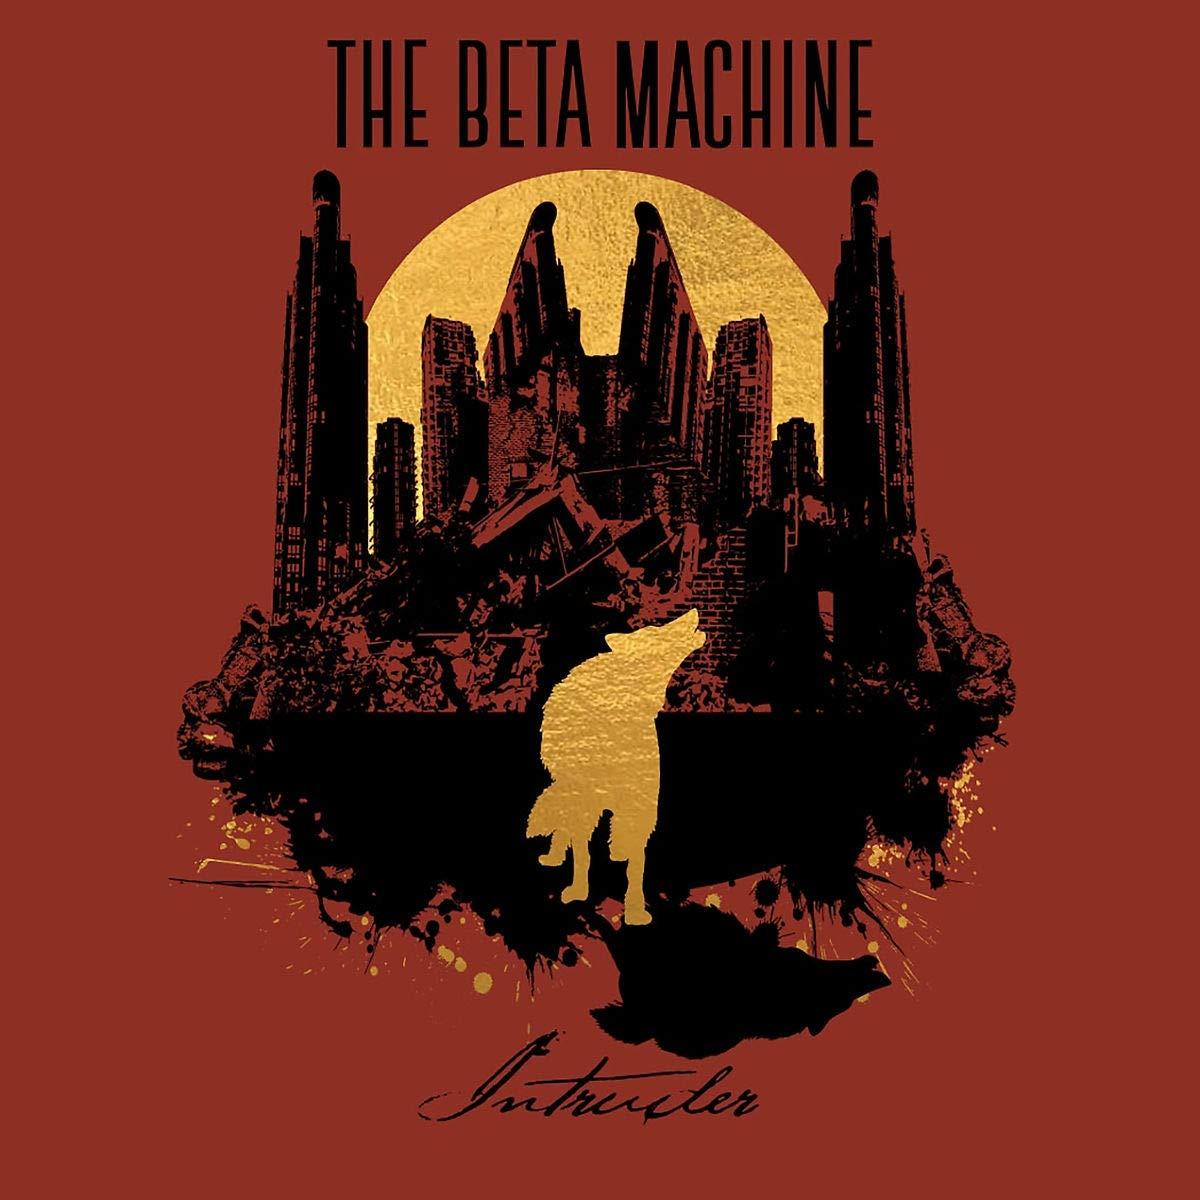 BETA MACHINE (THE) - INTRUDER (CD)